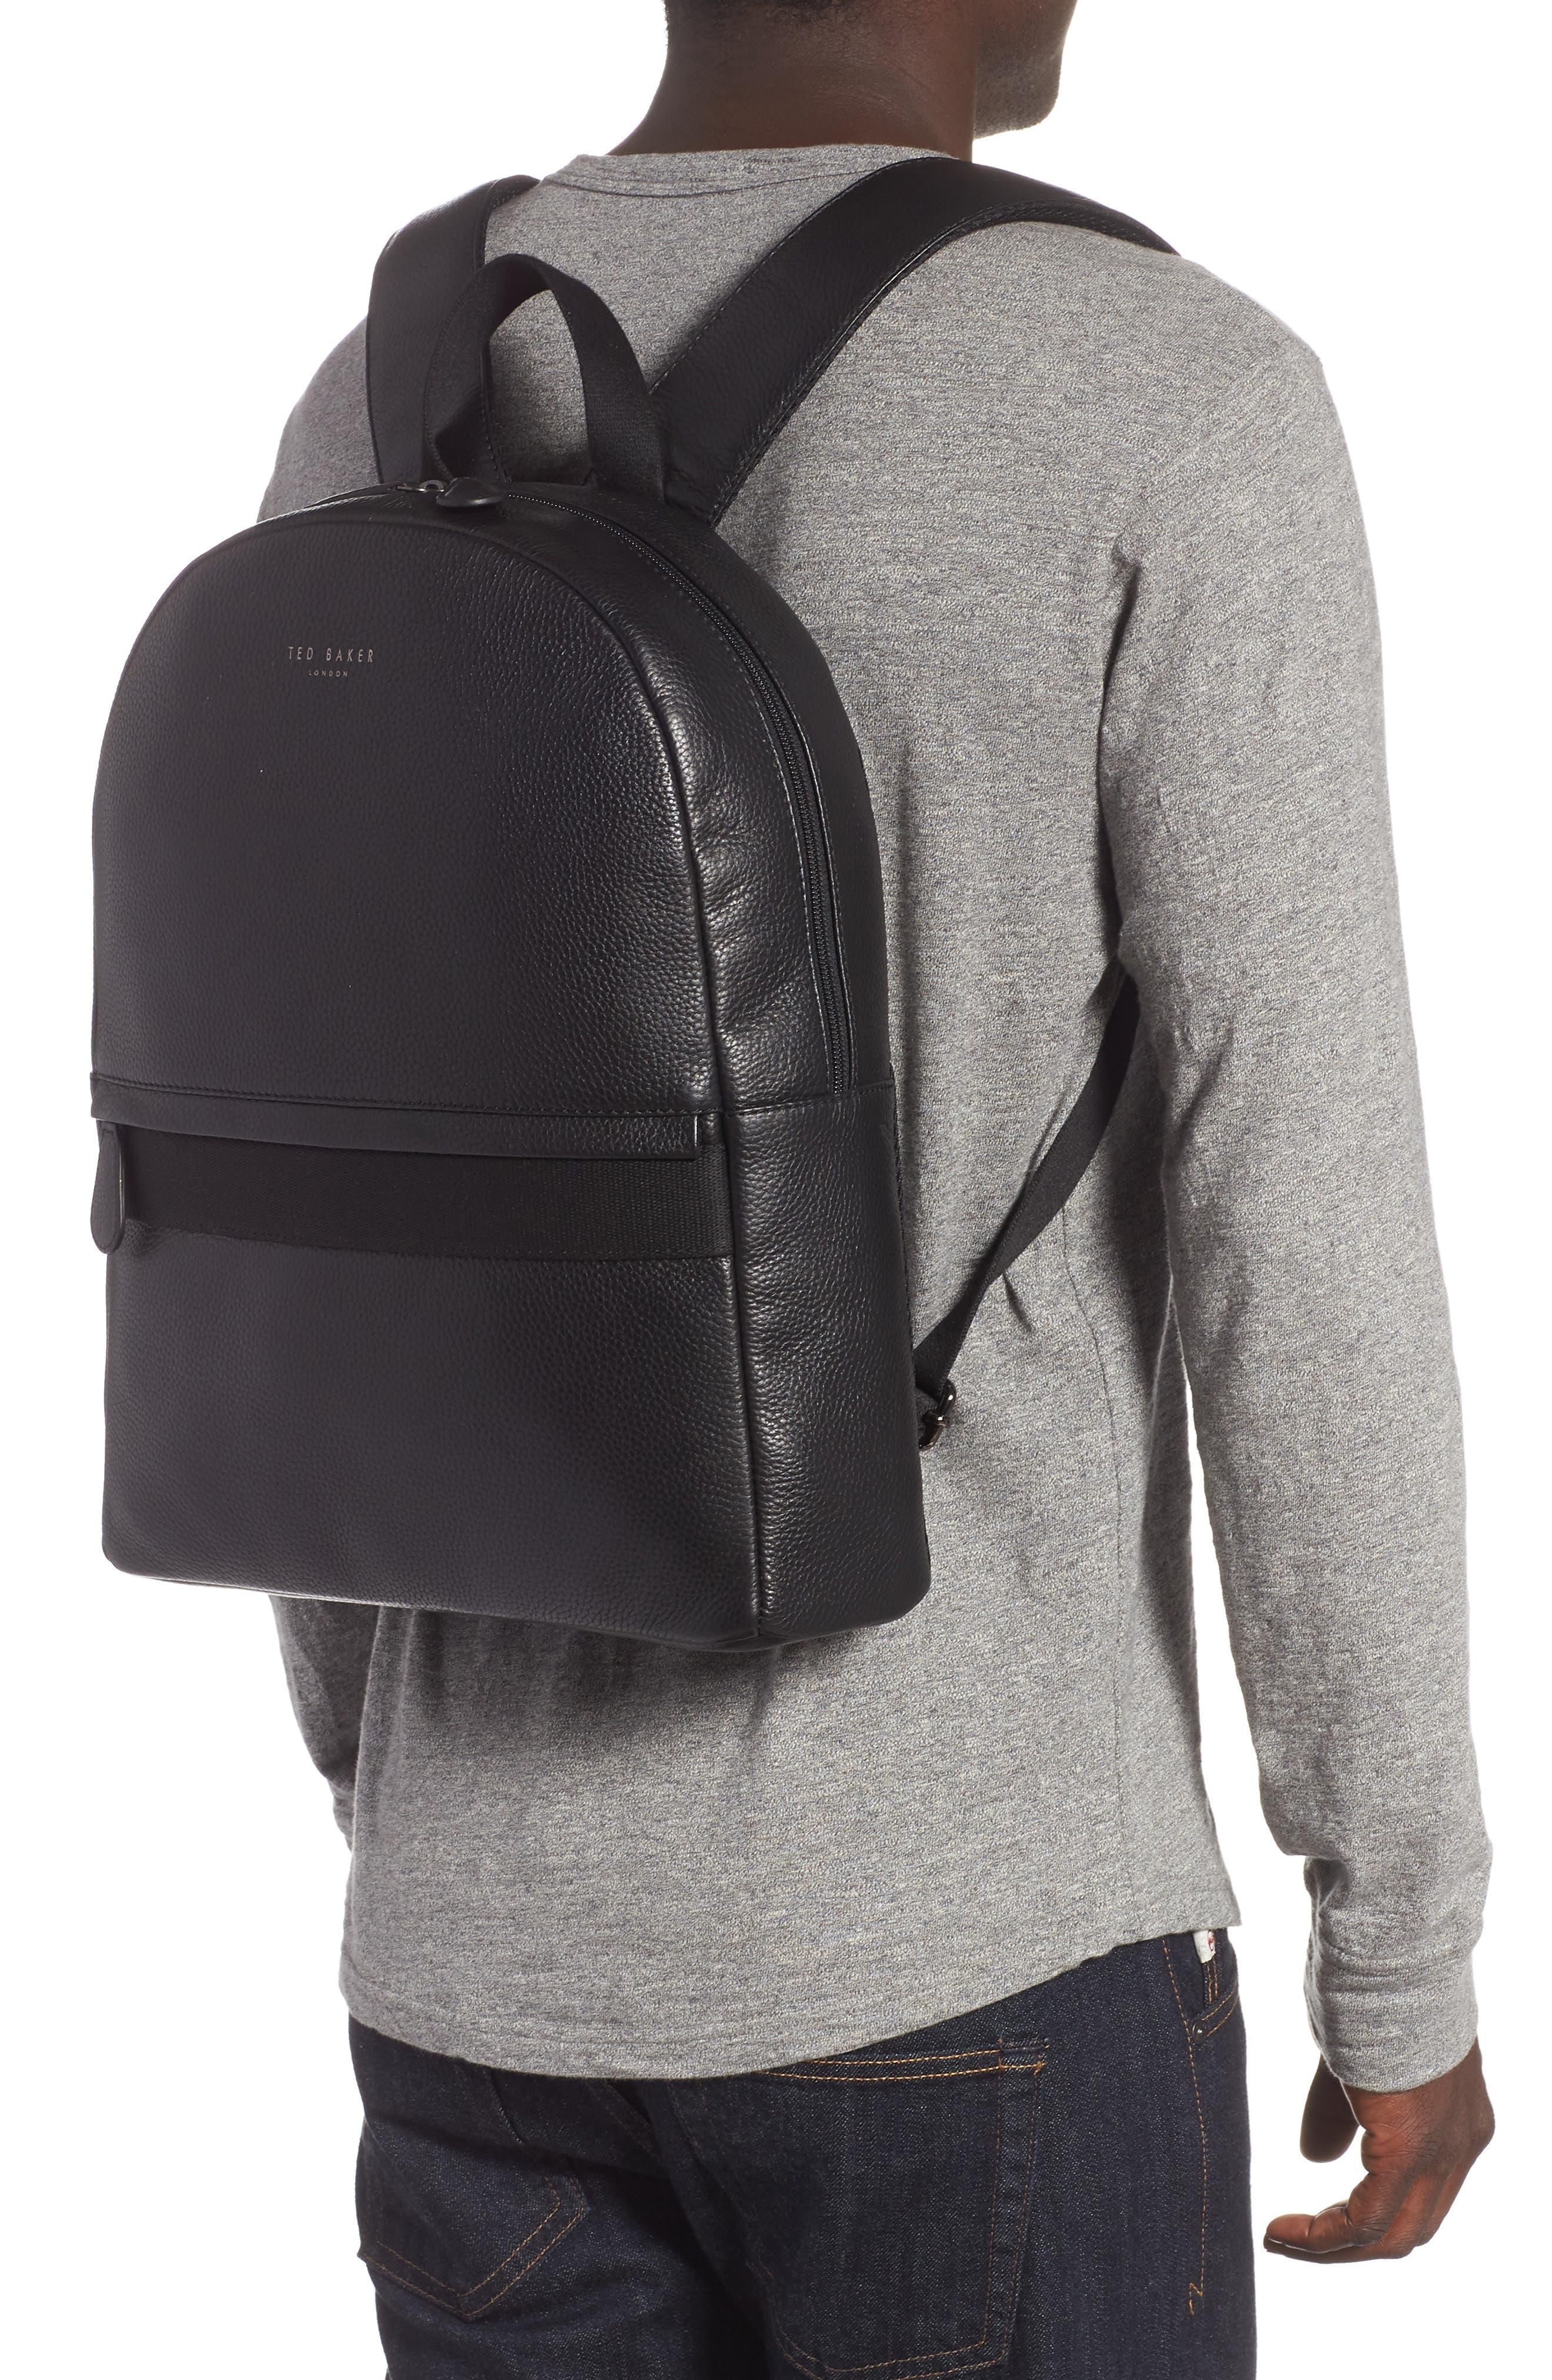 Rickrak Leather Backpack,                             Alternate thumbnail 2, color,                             BLACK